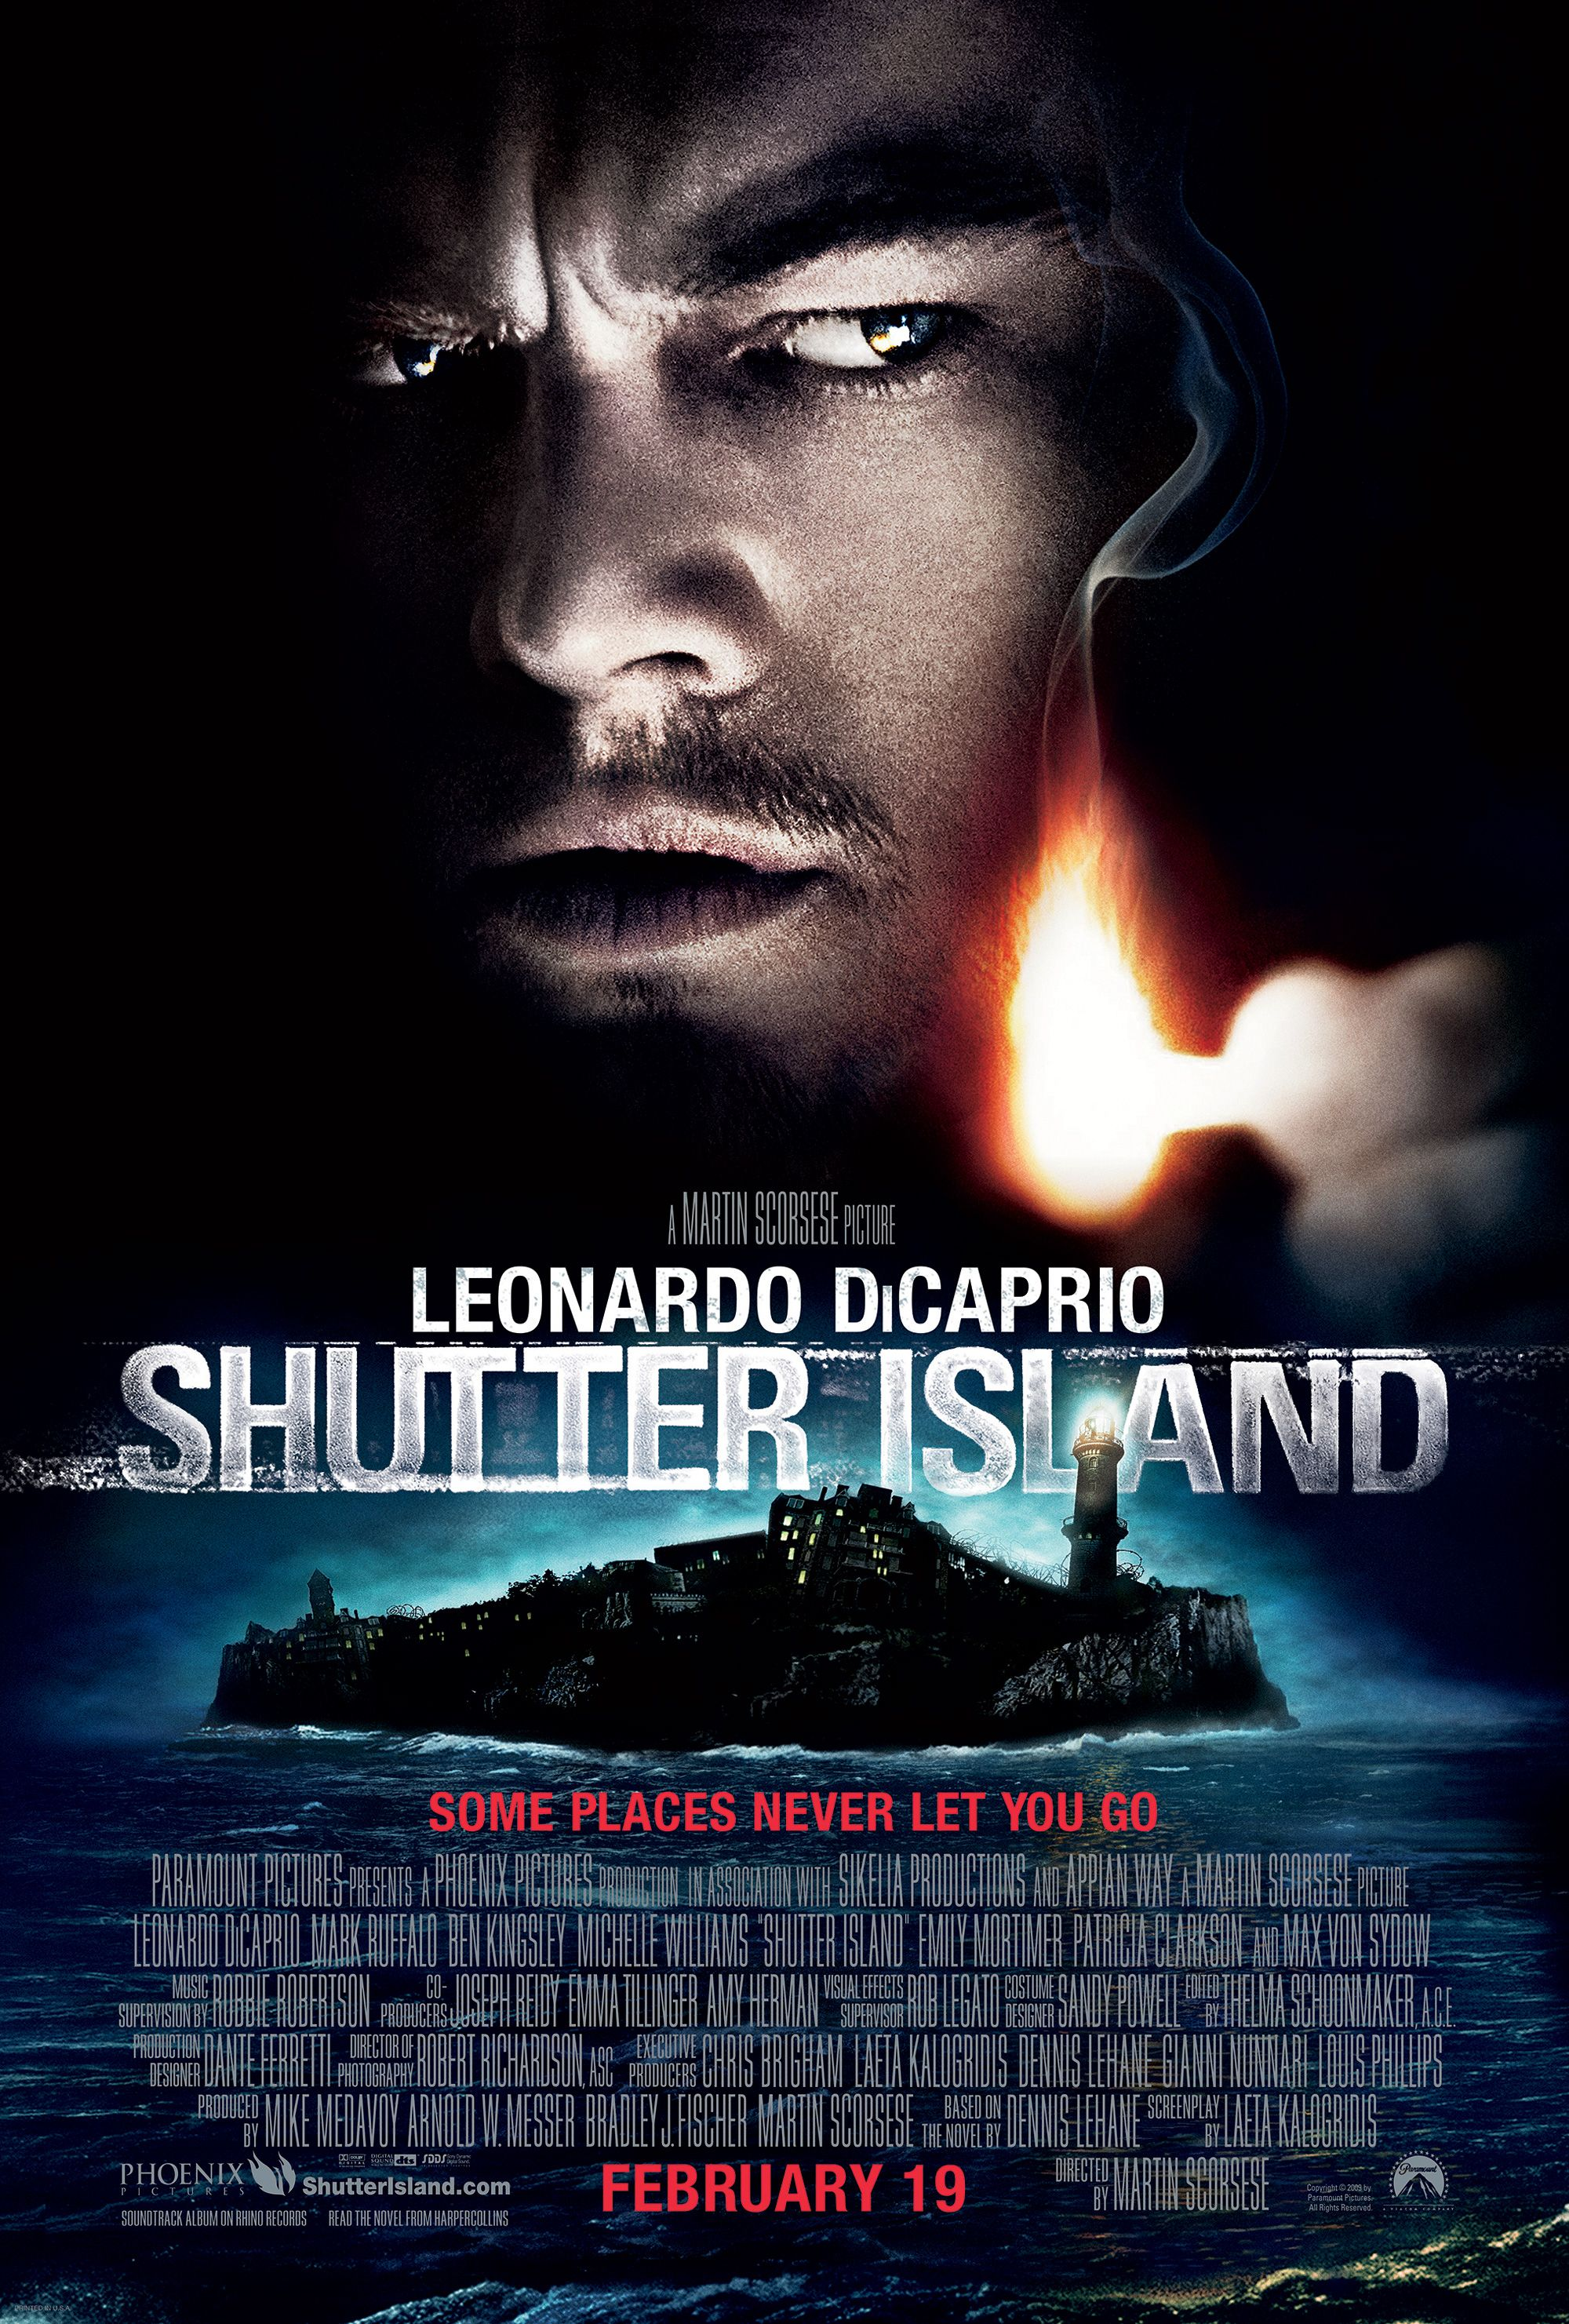 shutter island movie images starring leonardo dicaprio